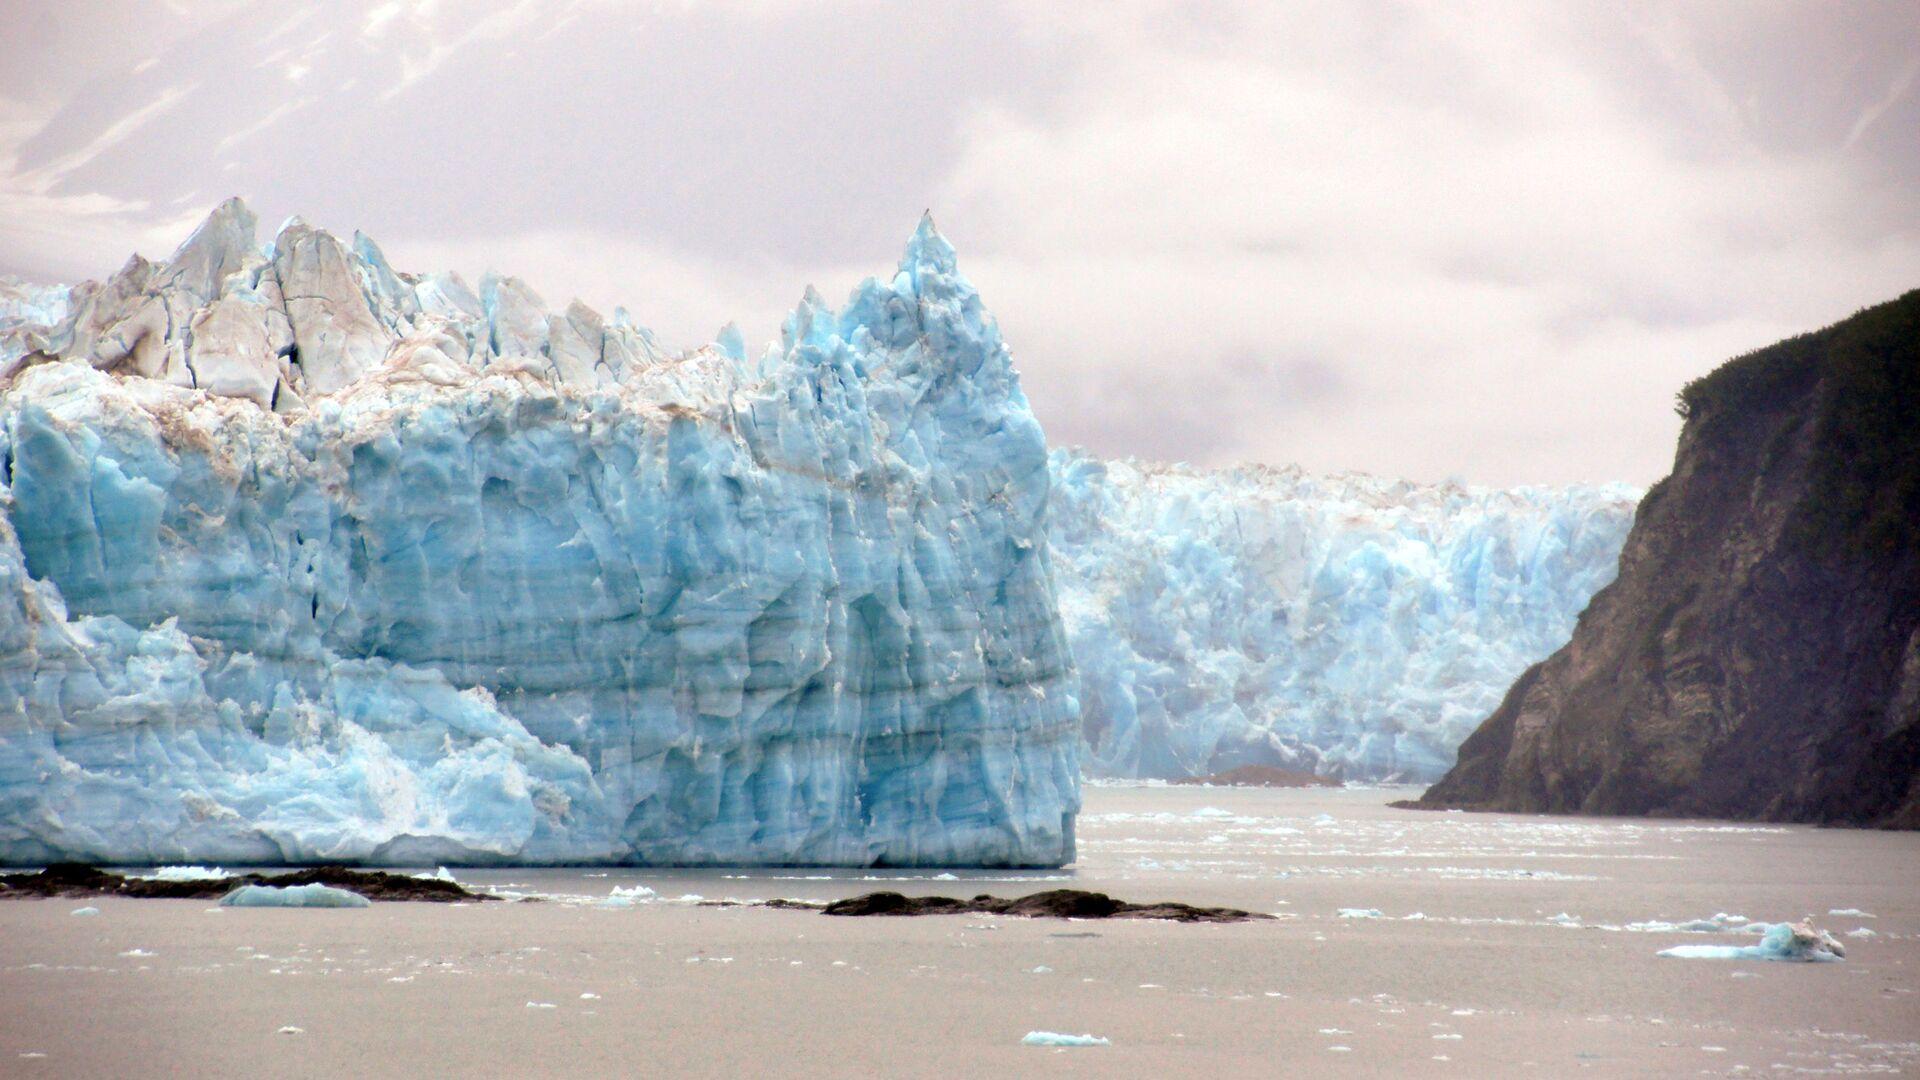 Glaciares de Alaska, EEUU (imagen referencial) - Sputnik Mundo, 1920, 19.01.2021